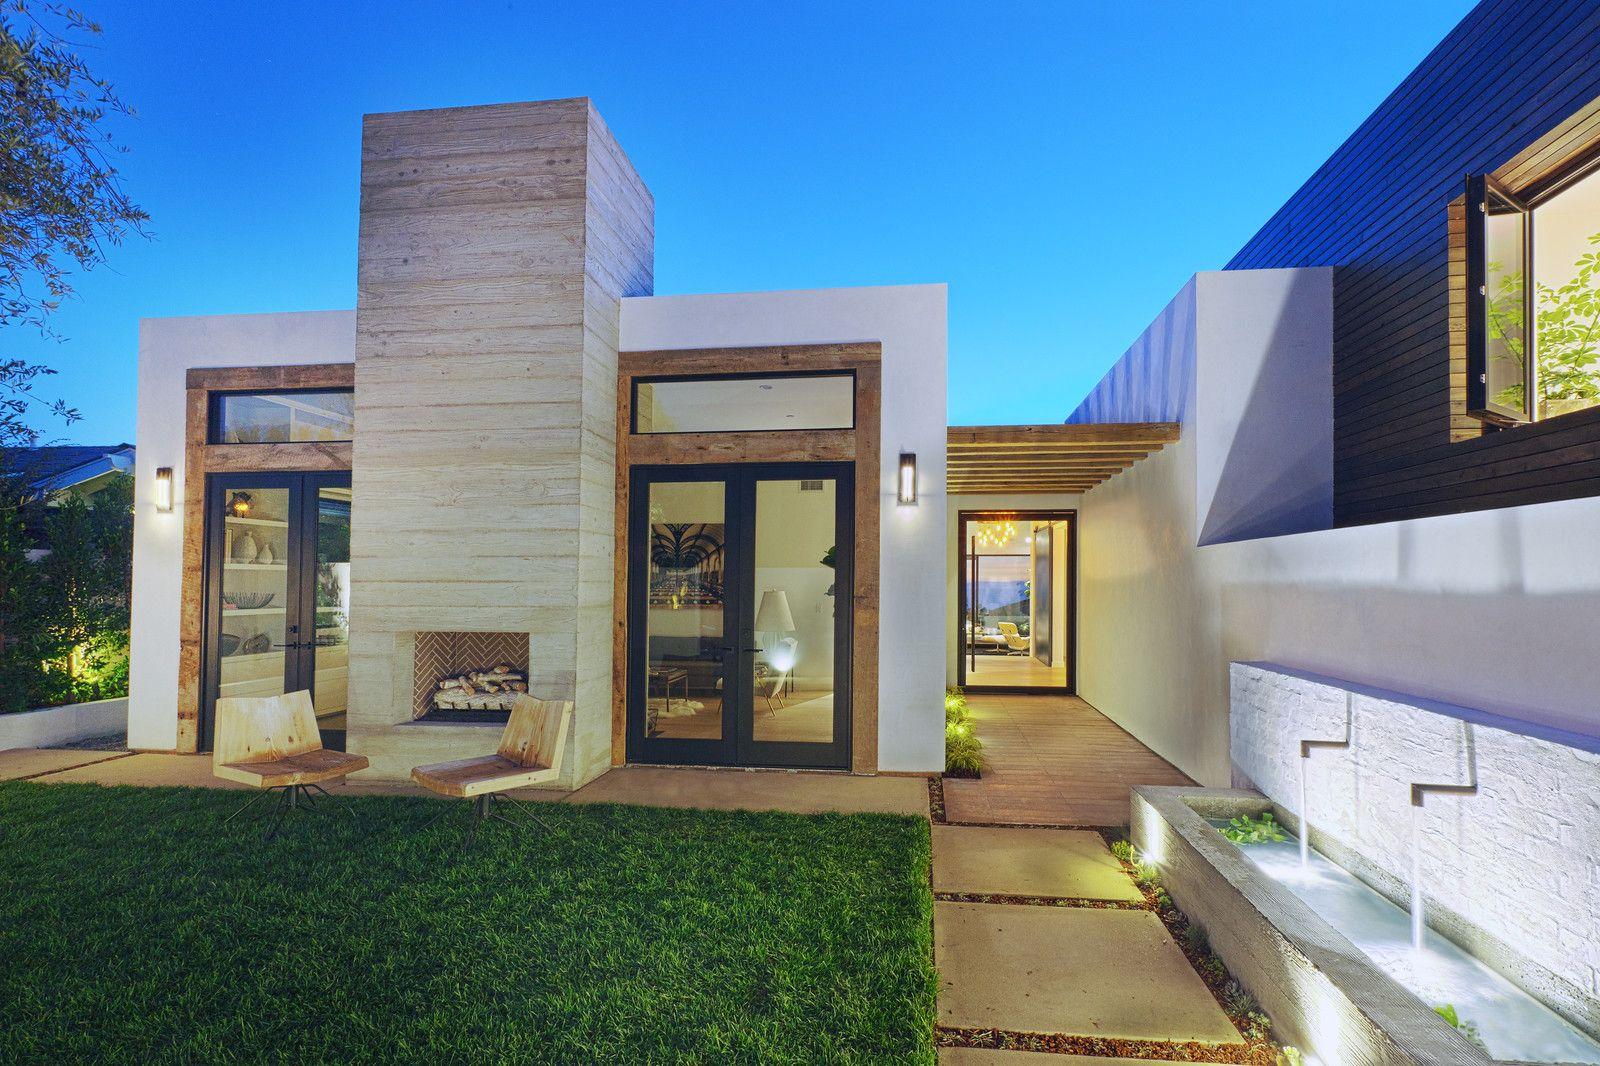 Garden Studio Design Point Sur Corona